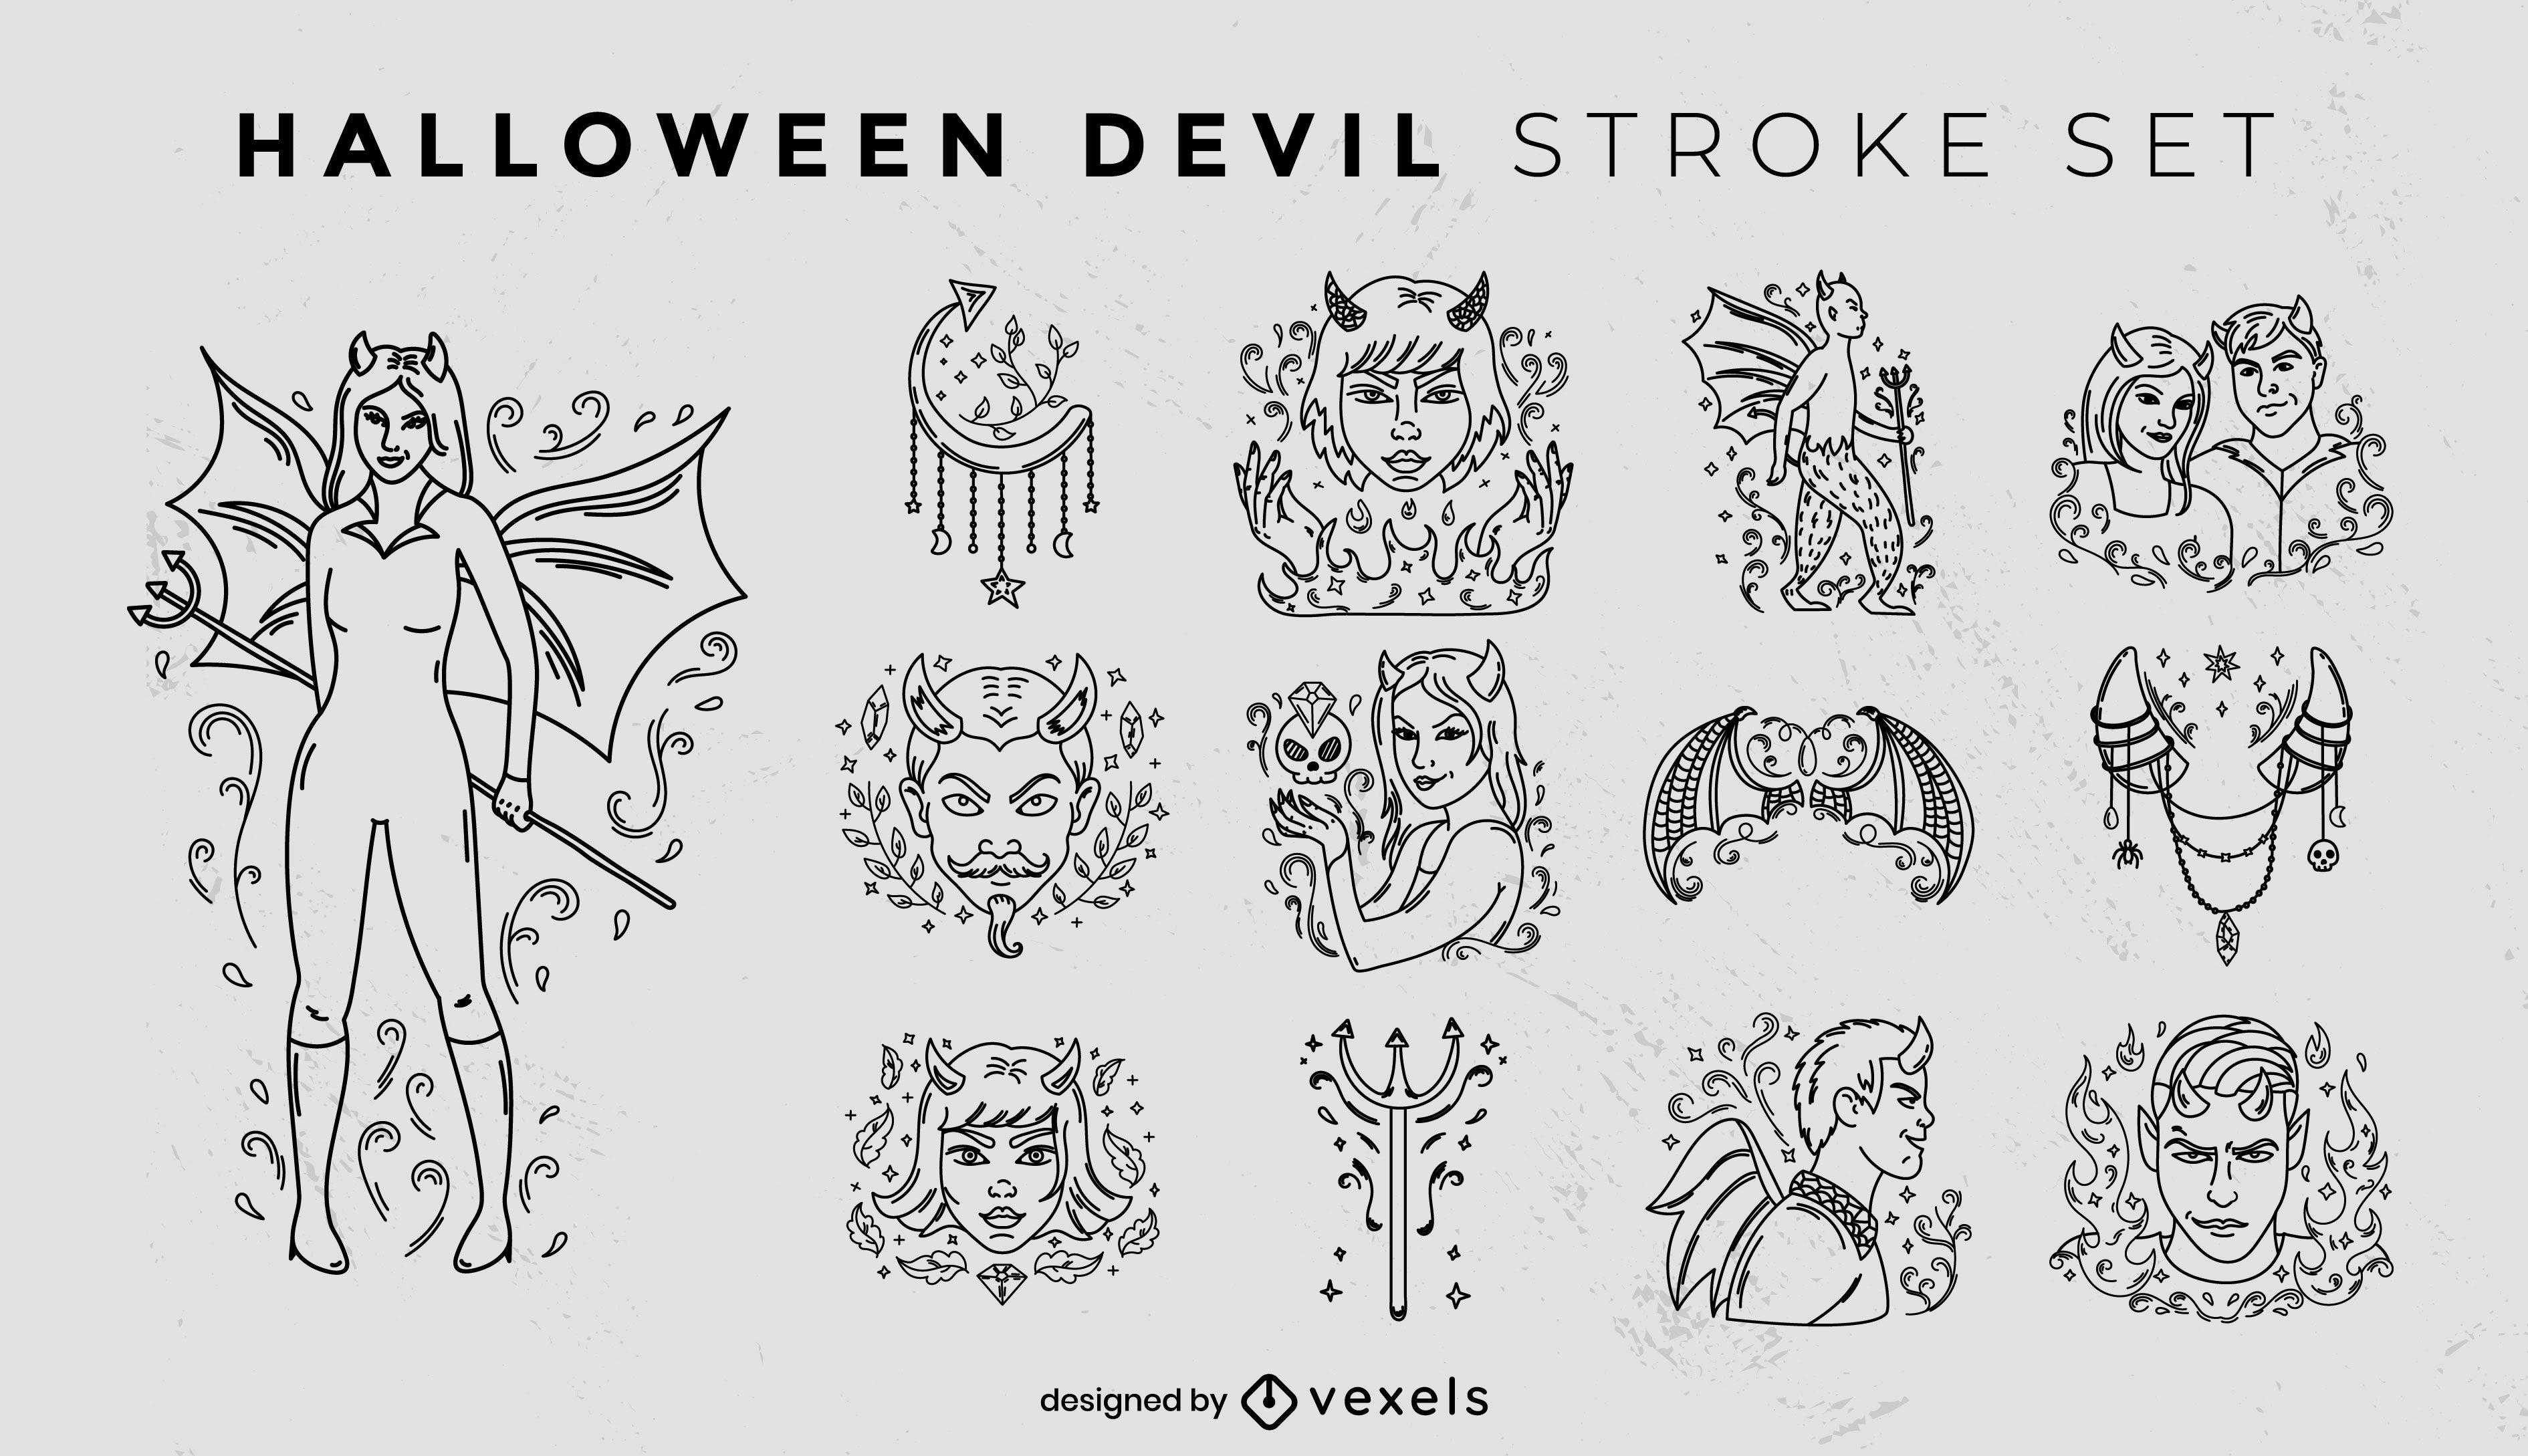 Halloween devil stroke set